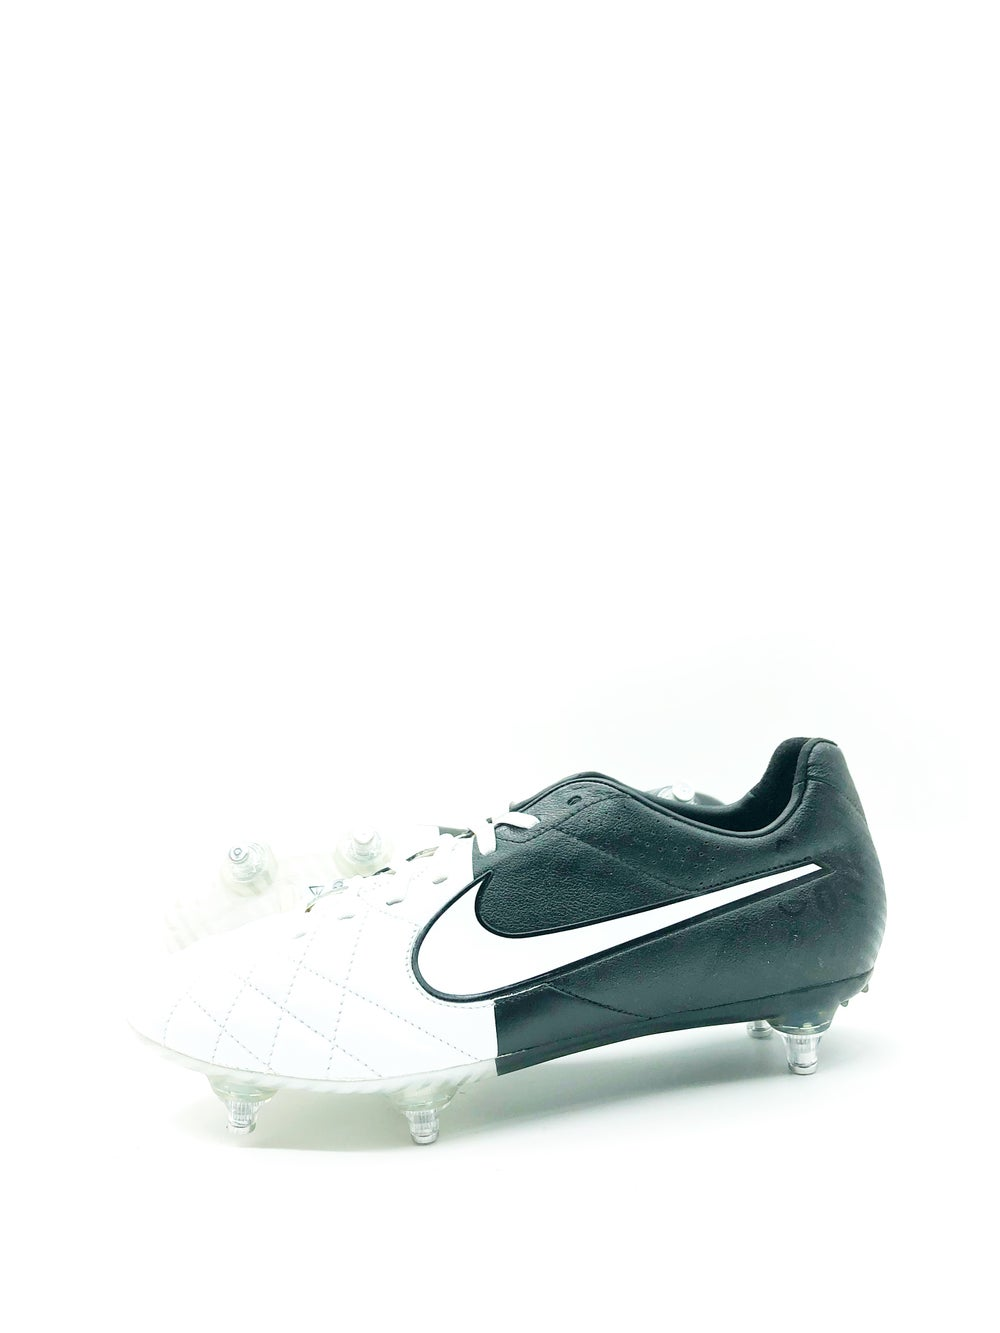 Image of Nike Tiempo IV legend SG